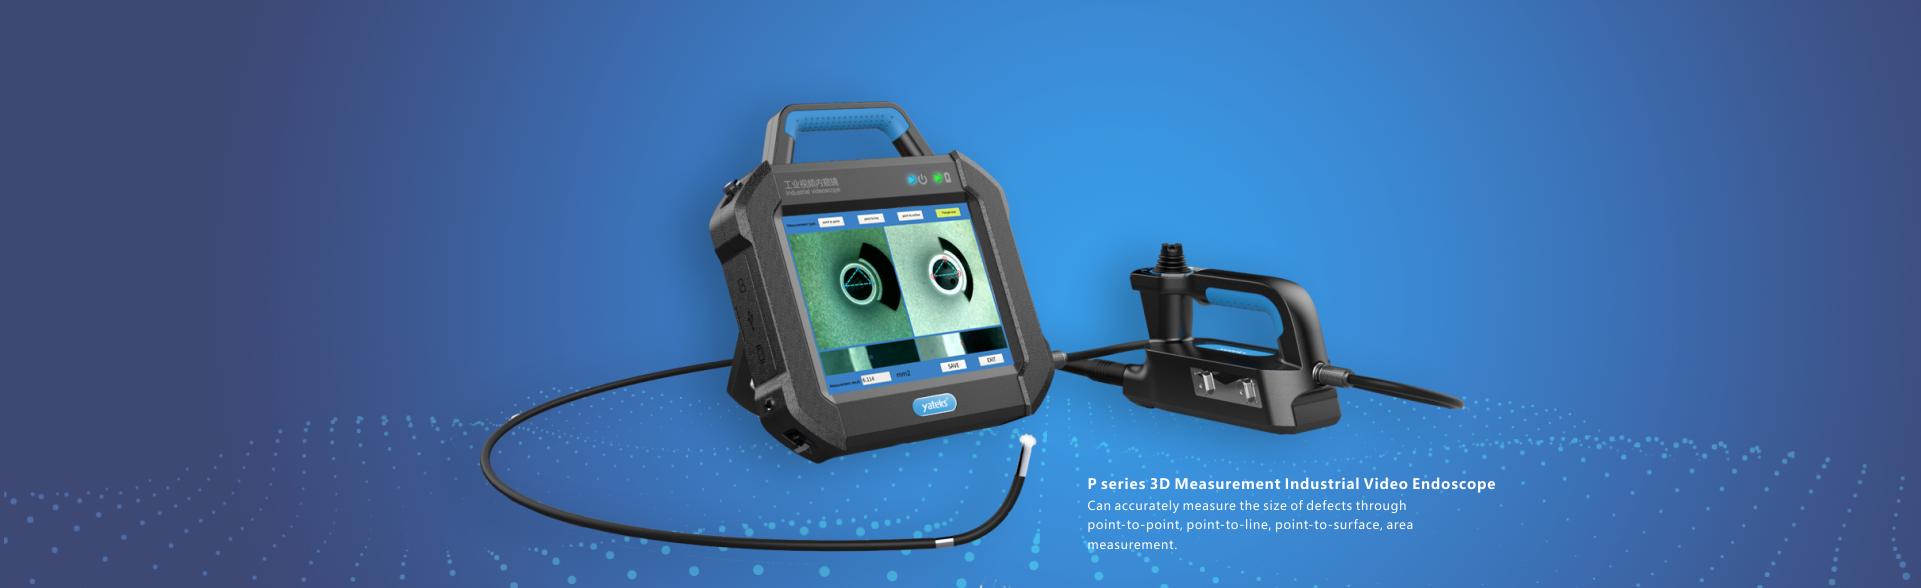 Yateks P series 3D measurement endoscope